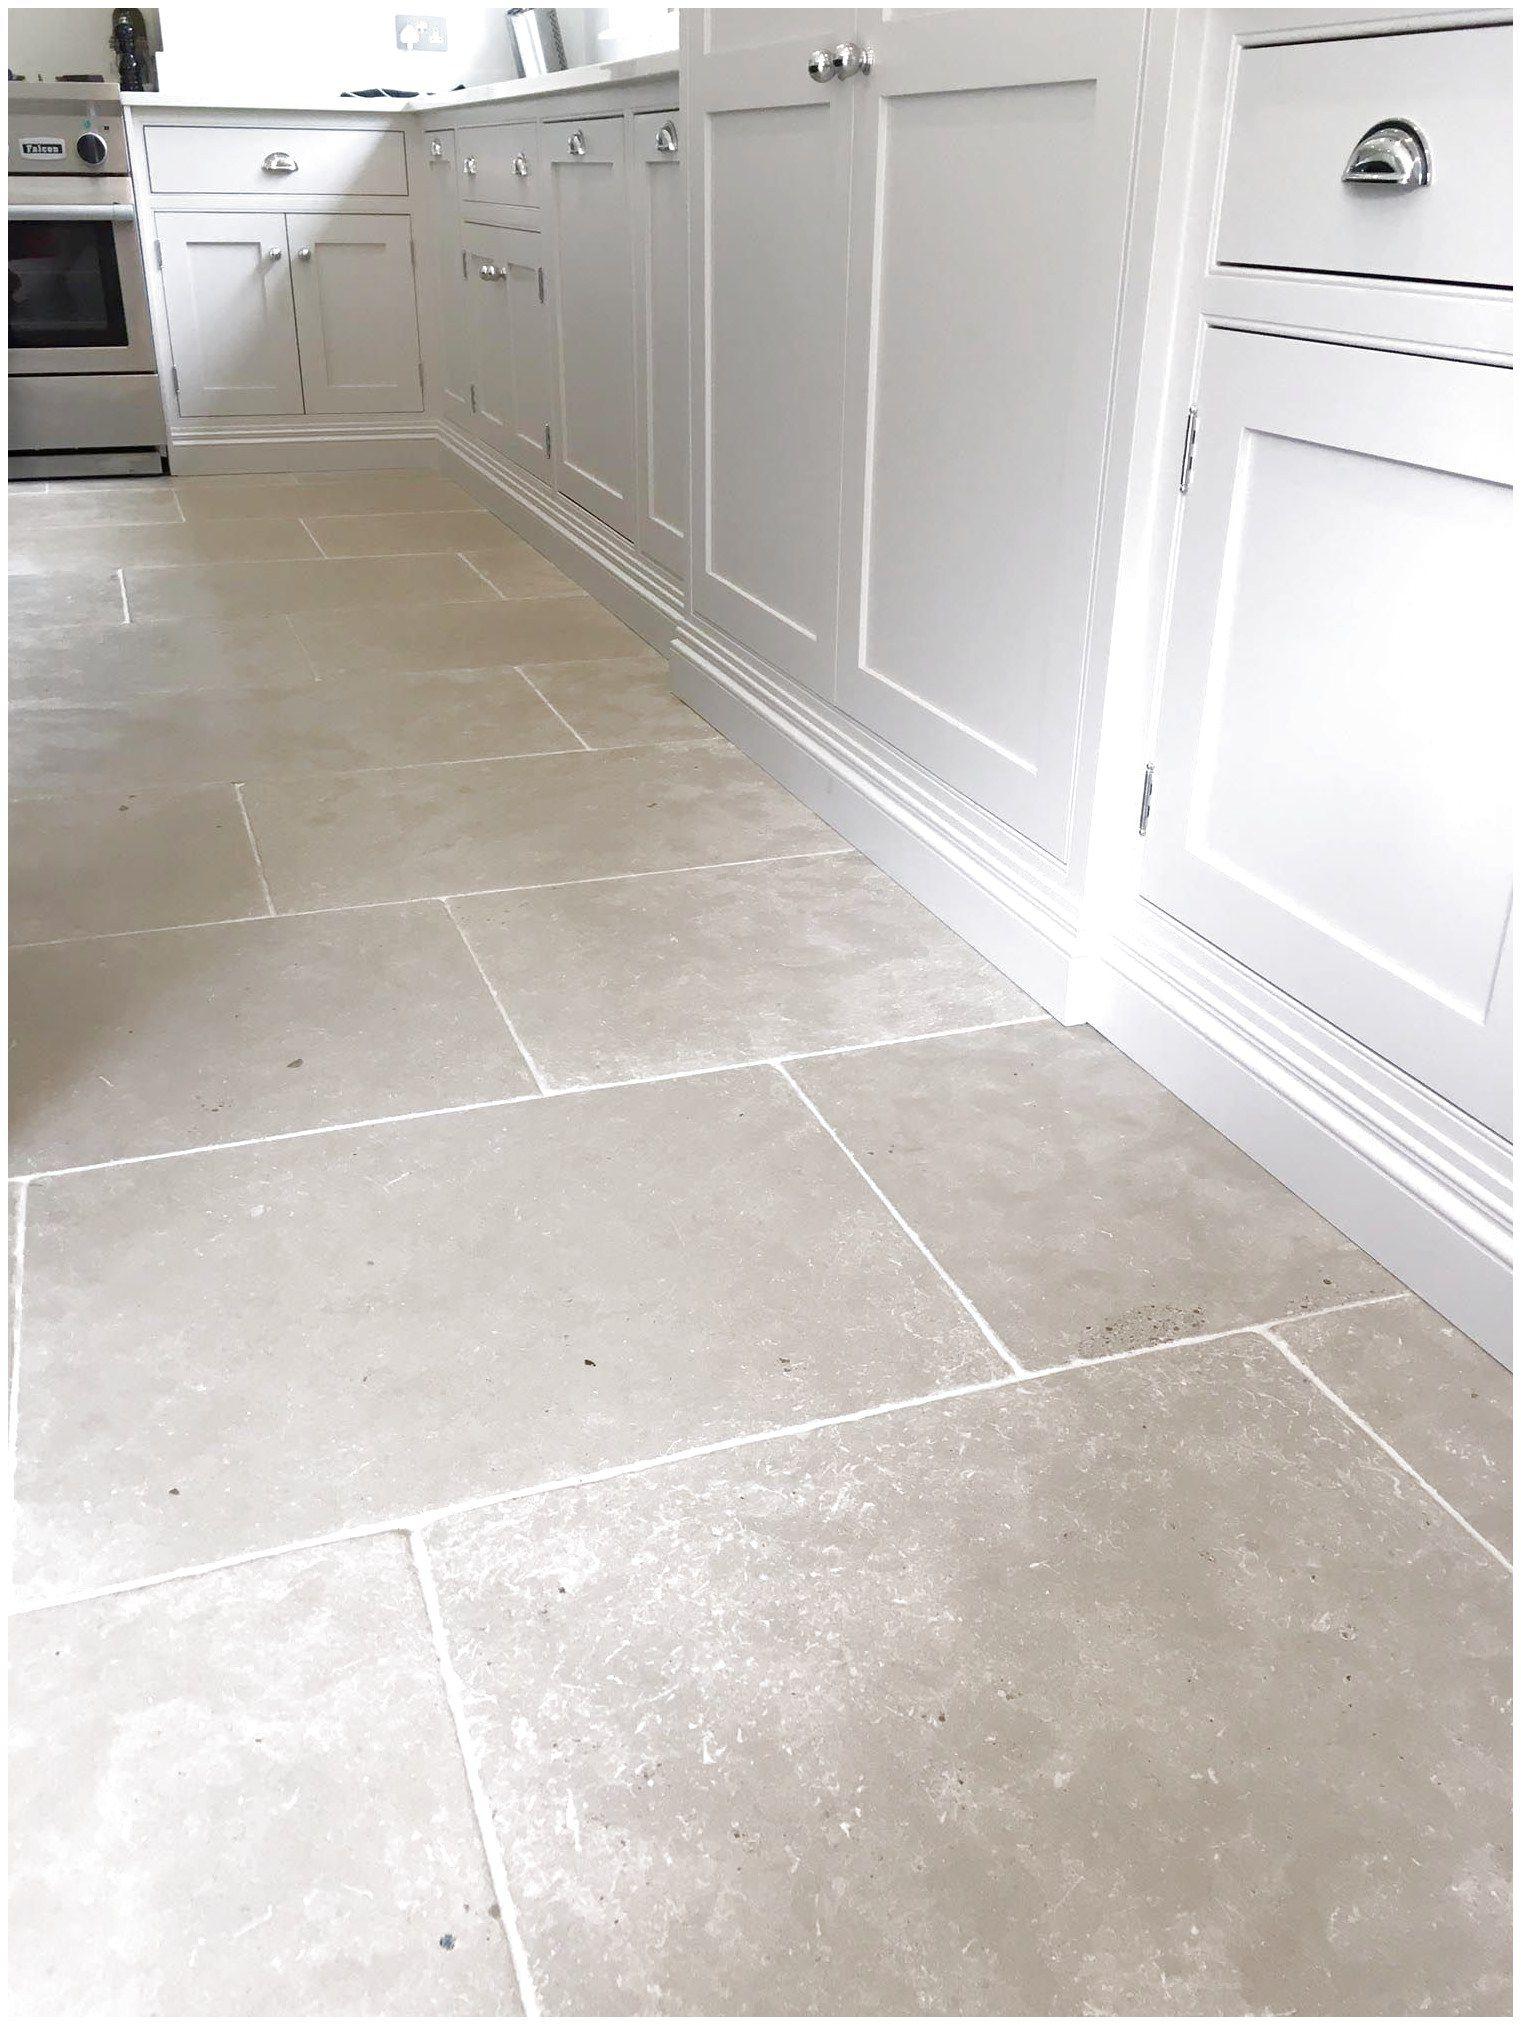 Bottom Cabinet Molding Homeflooring Click Now For More Info House Flooring Kitchen Flooring Modern Farmhouse Kitchens